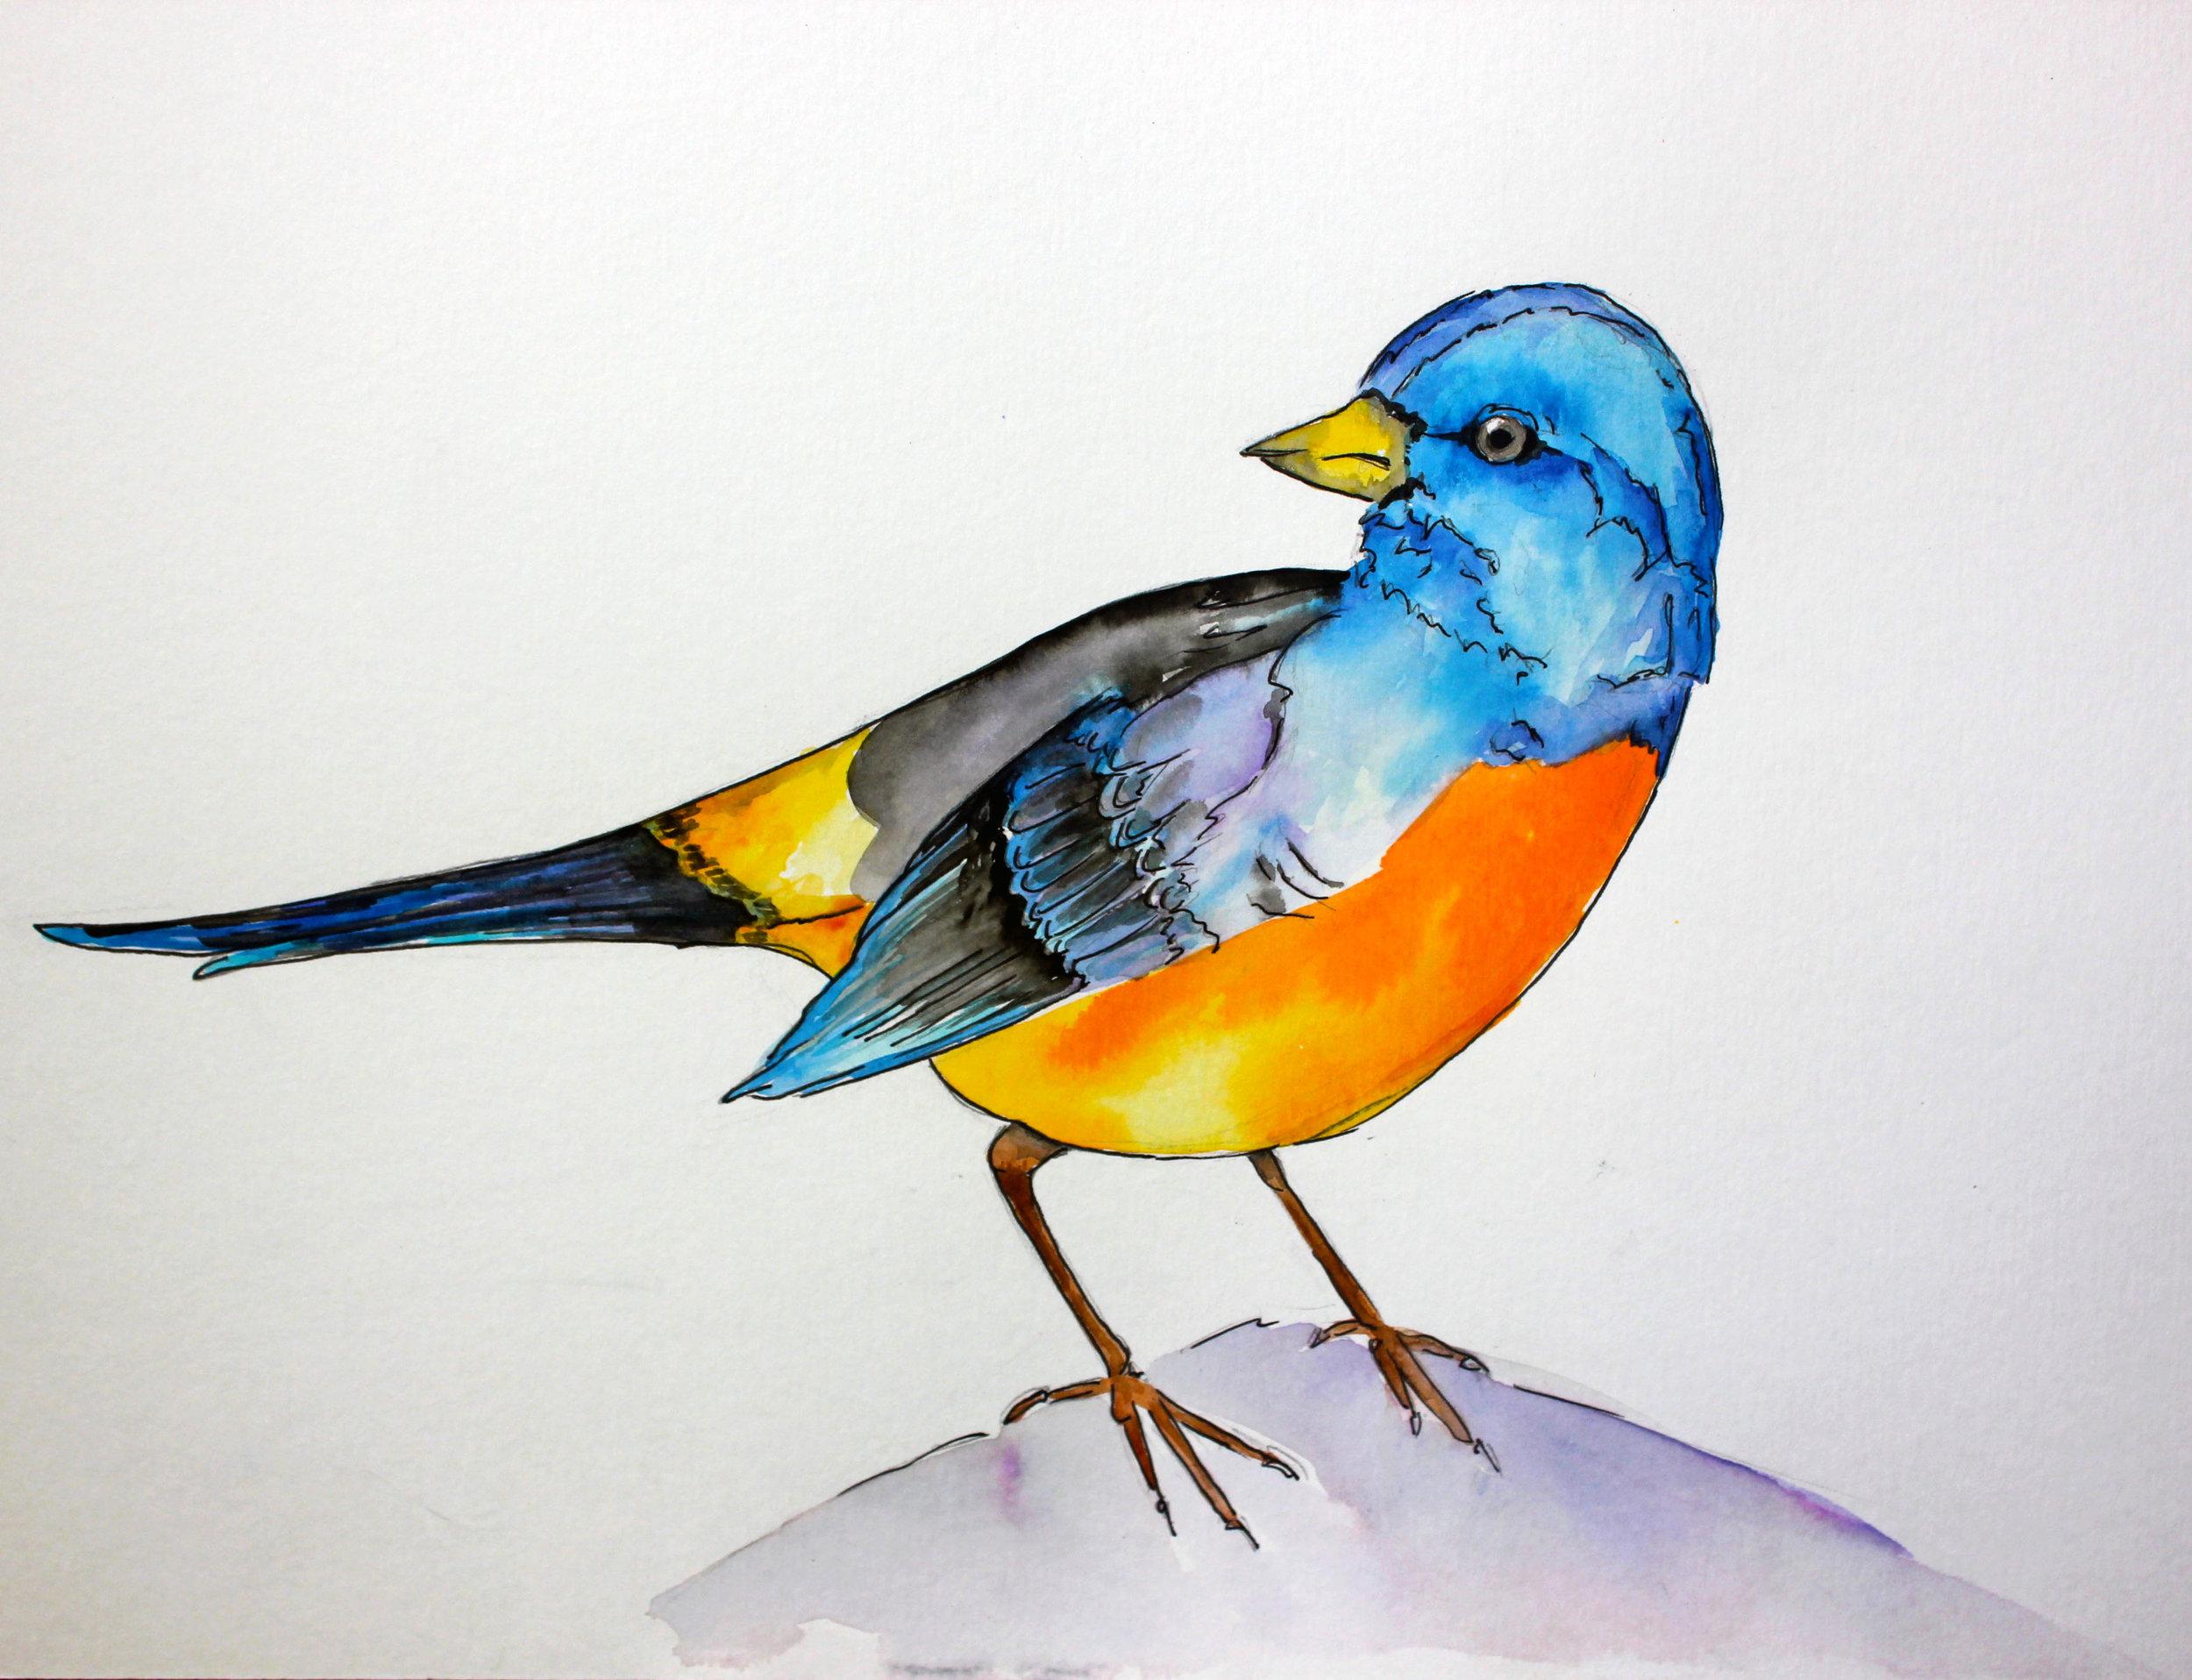 Bird_watercolor_chase.jpg